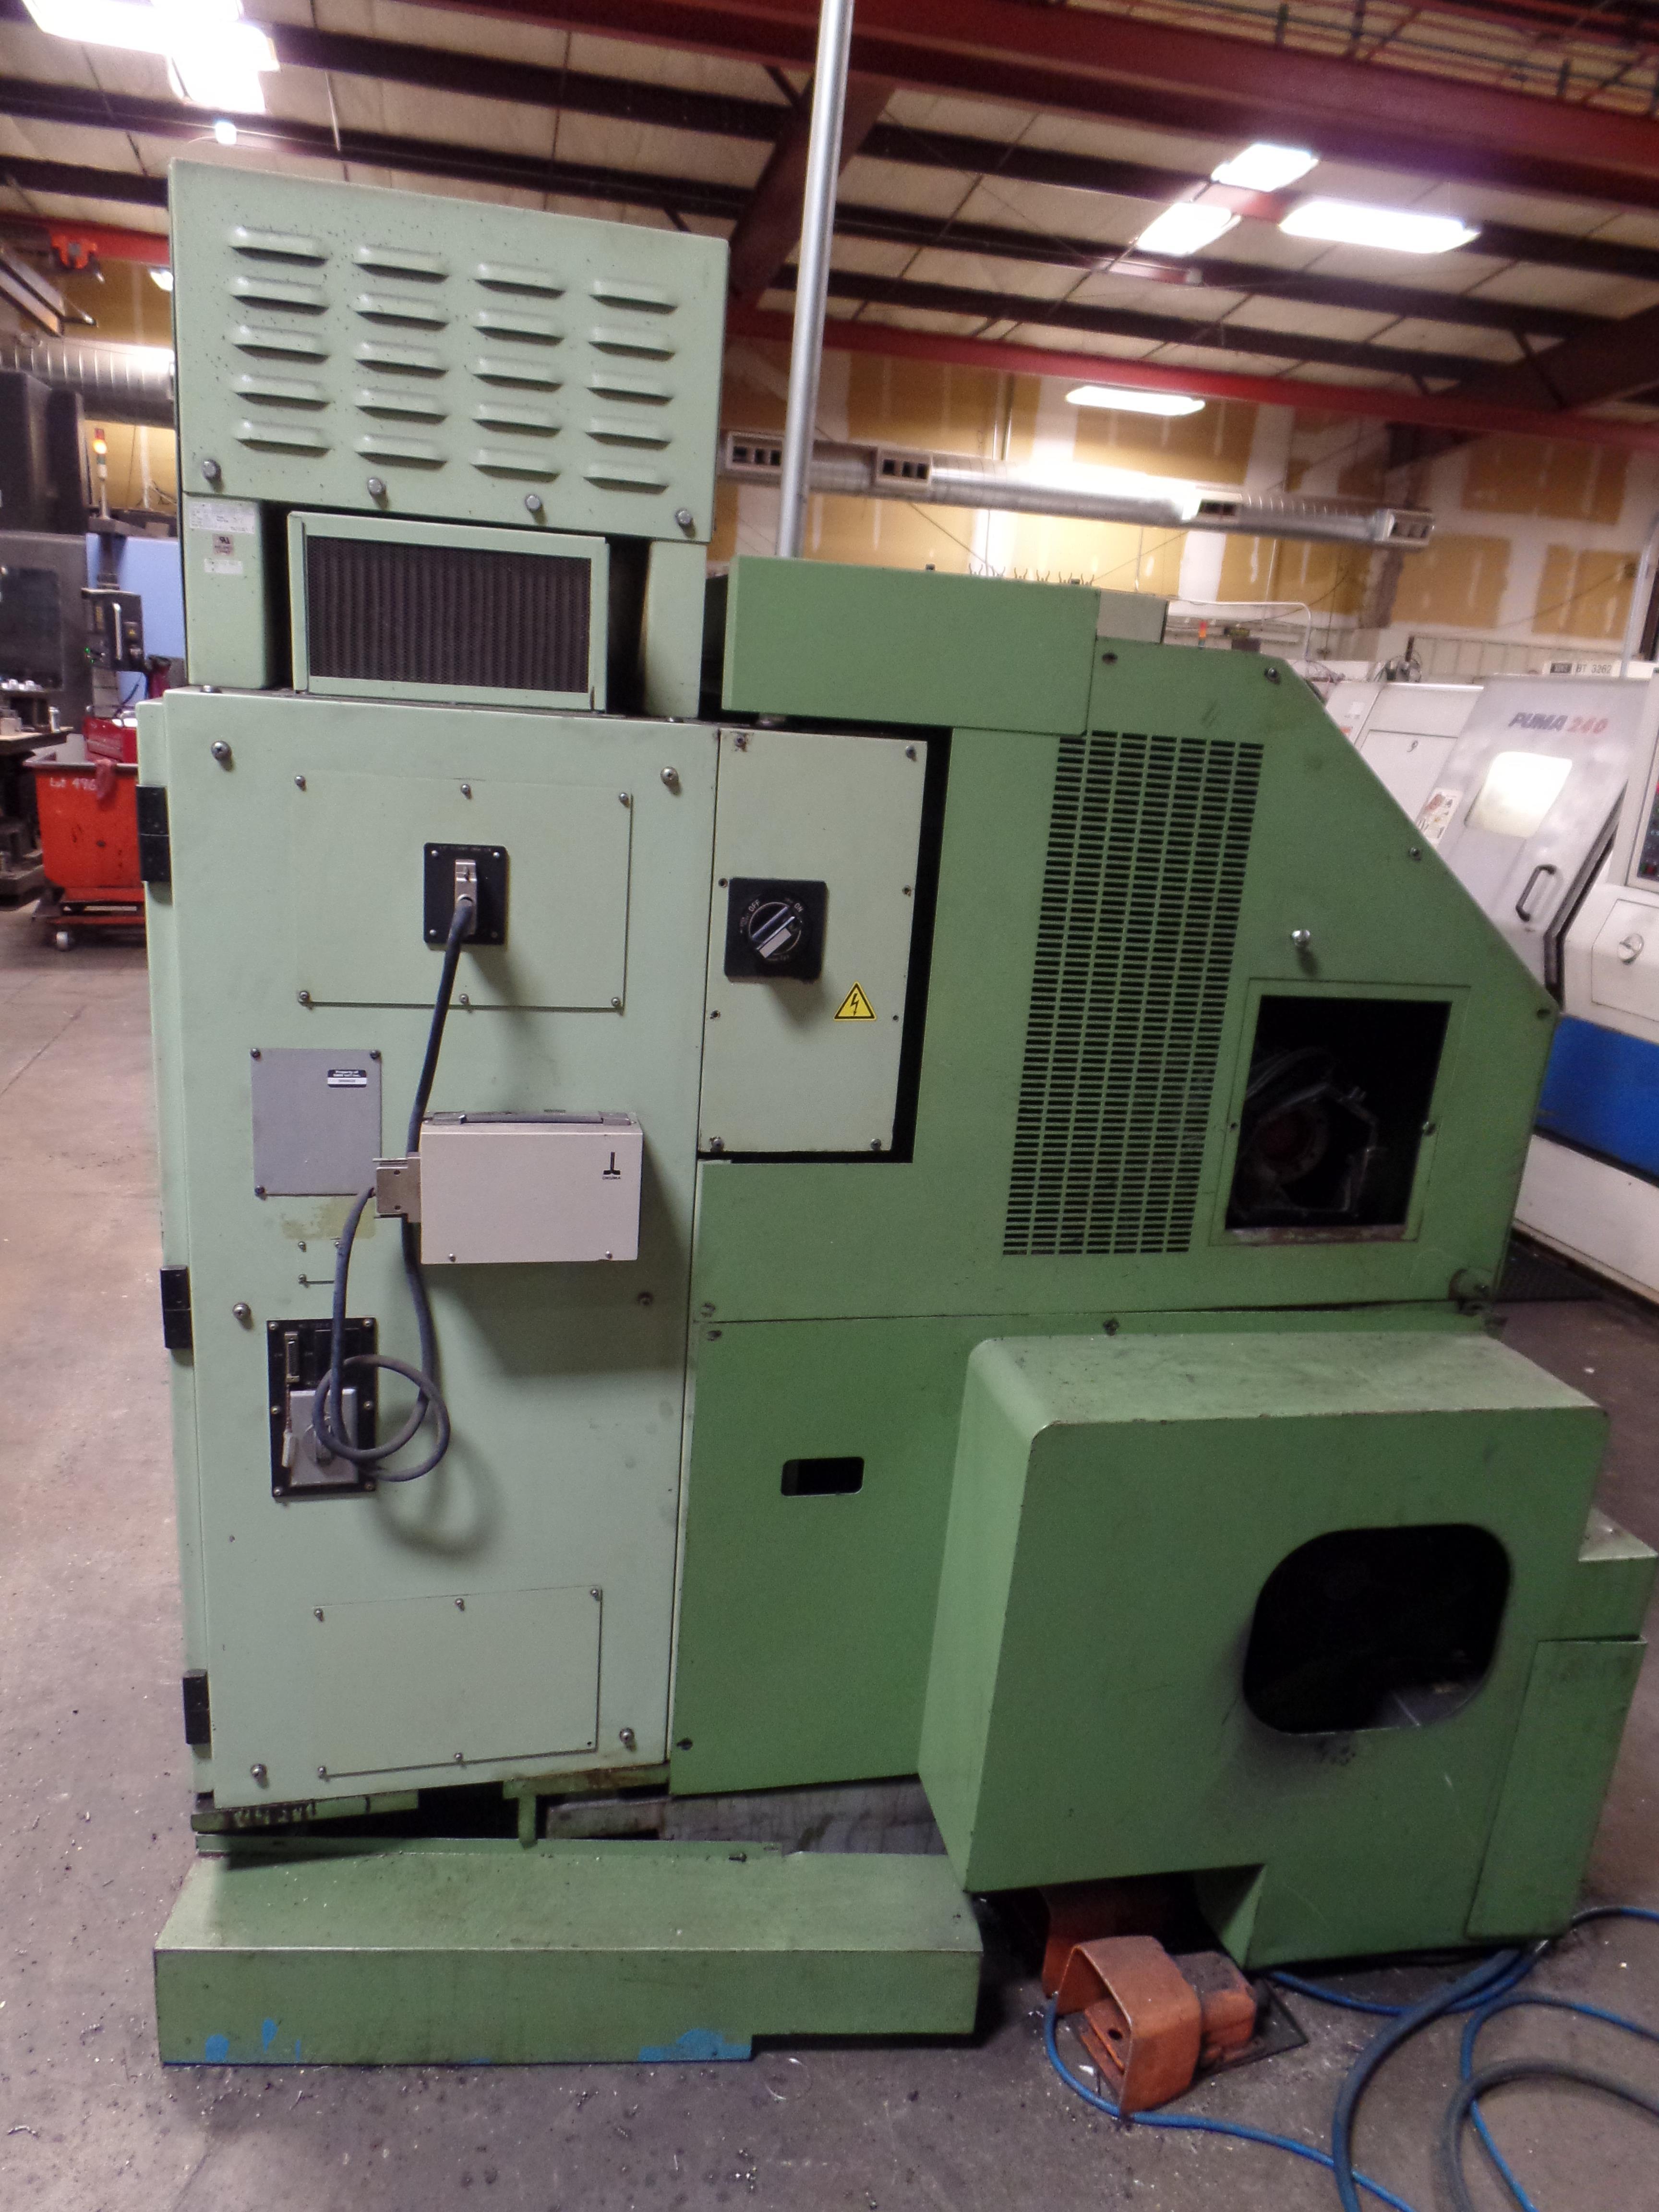 "Lot 11 - 1996 Okuma LB 25 2 Axis CNC Lathe, 5020 control , chip conveyor, 10"" chuck SN: 02109123"